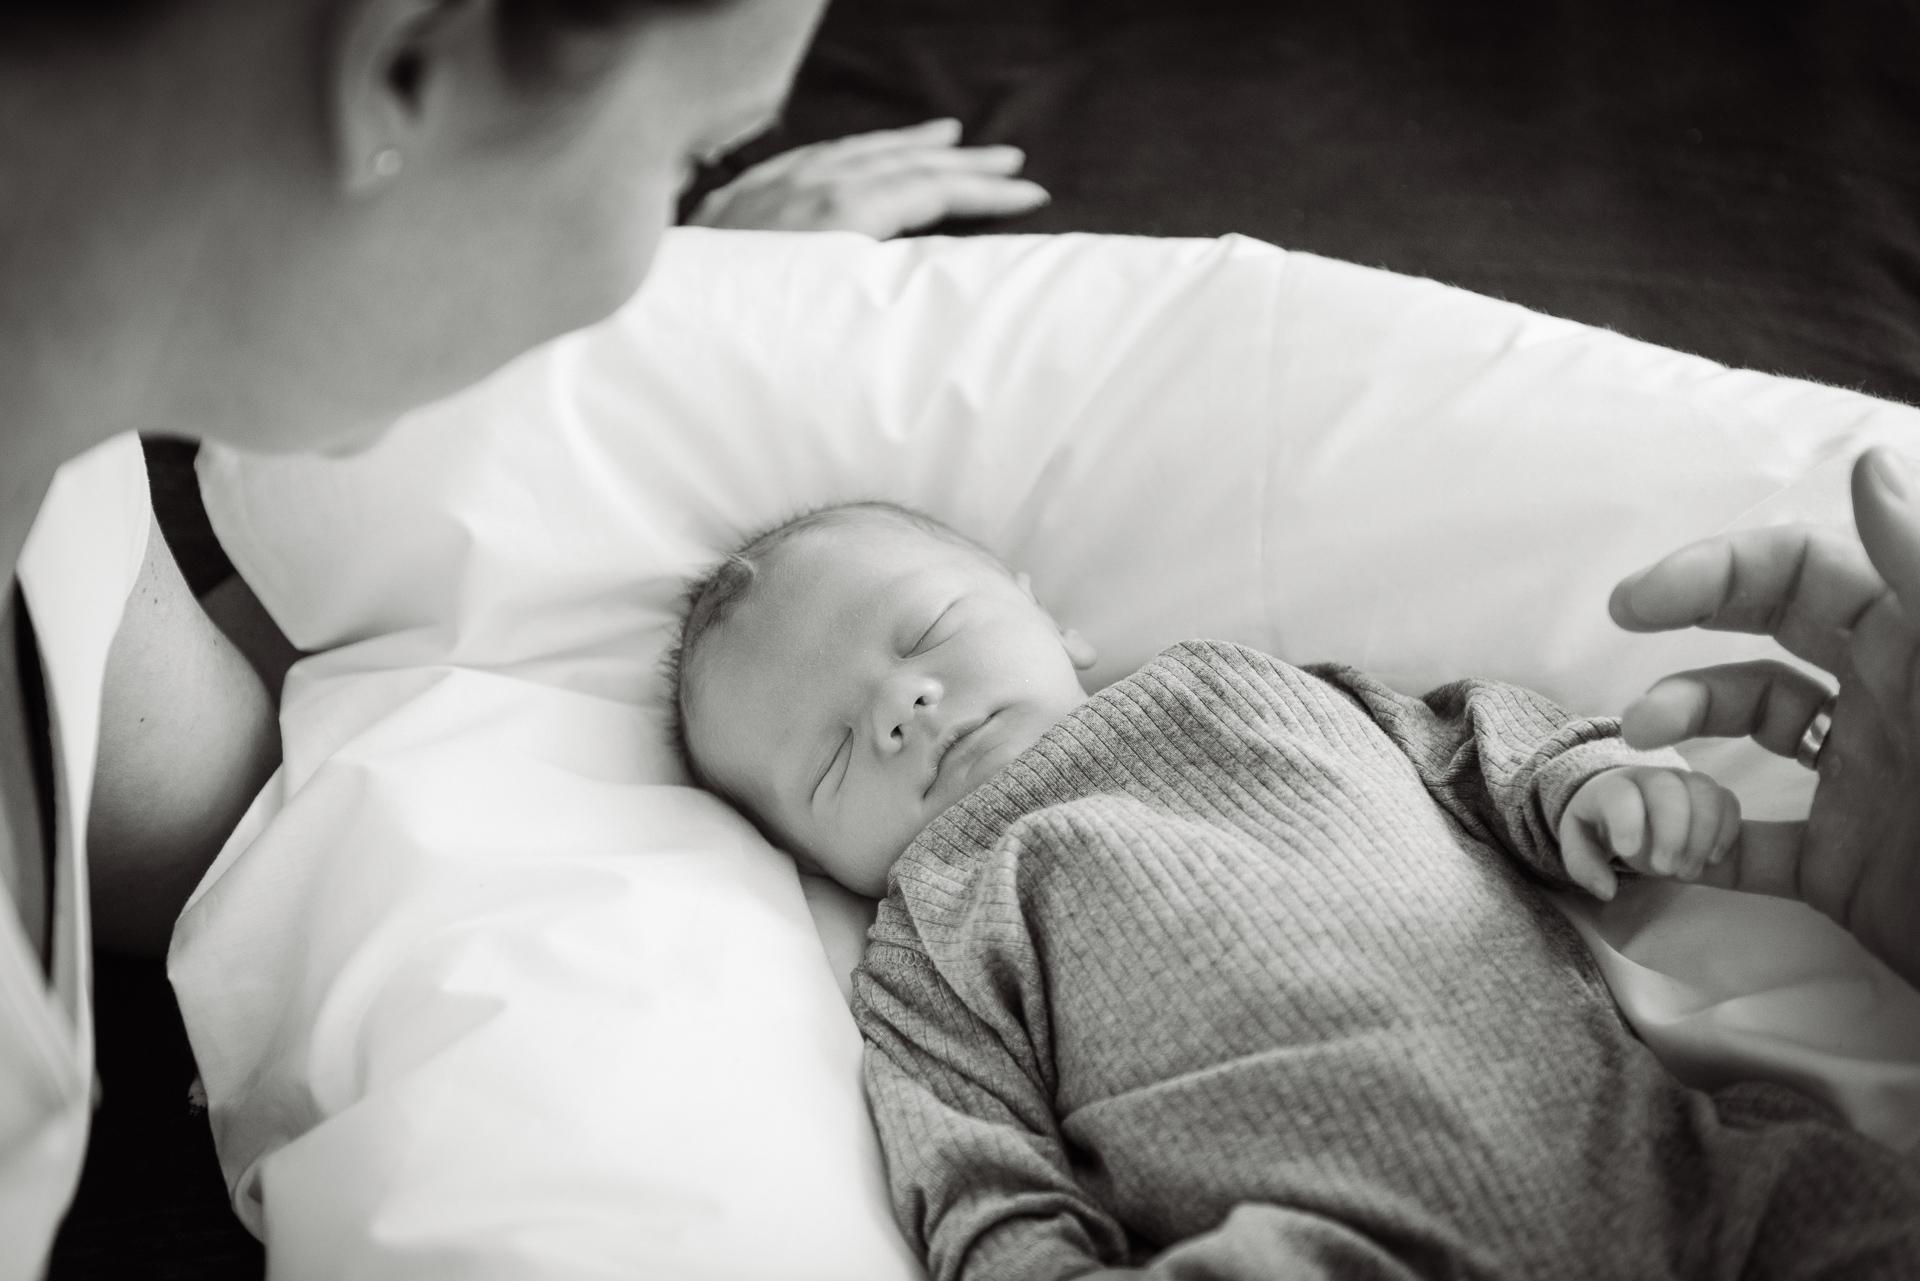 Theo_nyfødt_newborn_baby_04